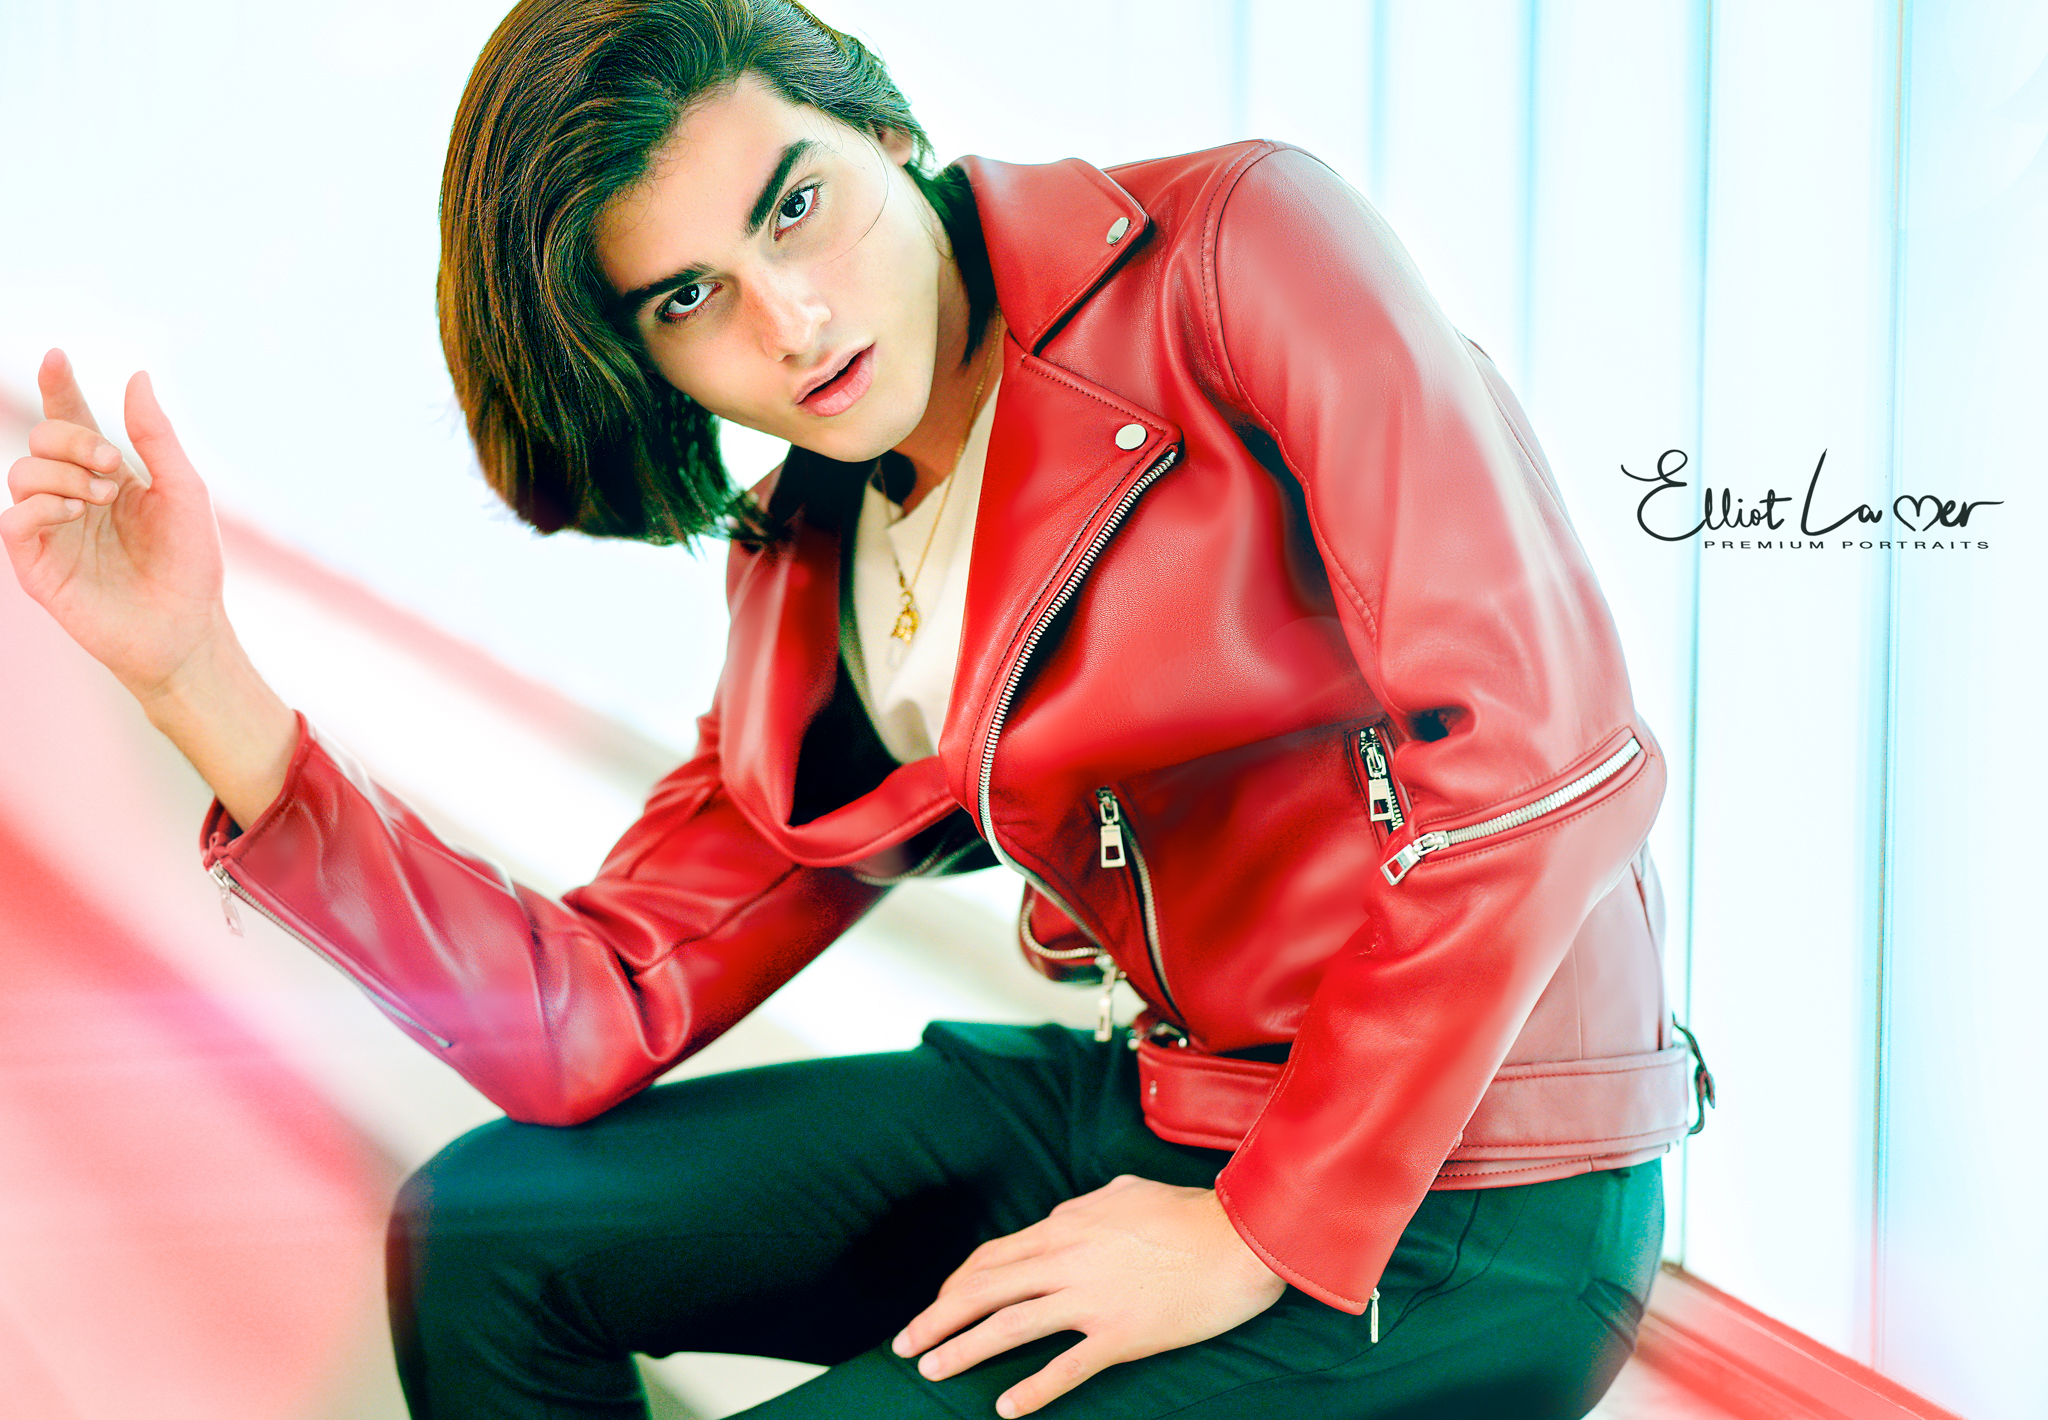 Model: Antonio